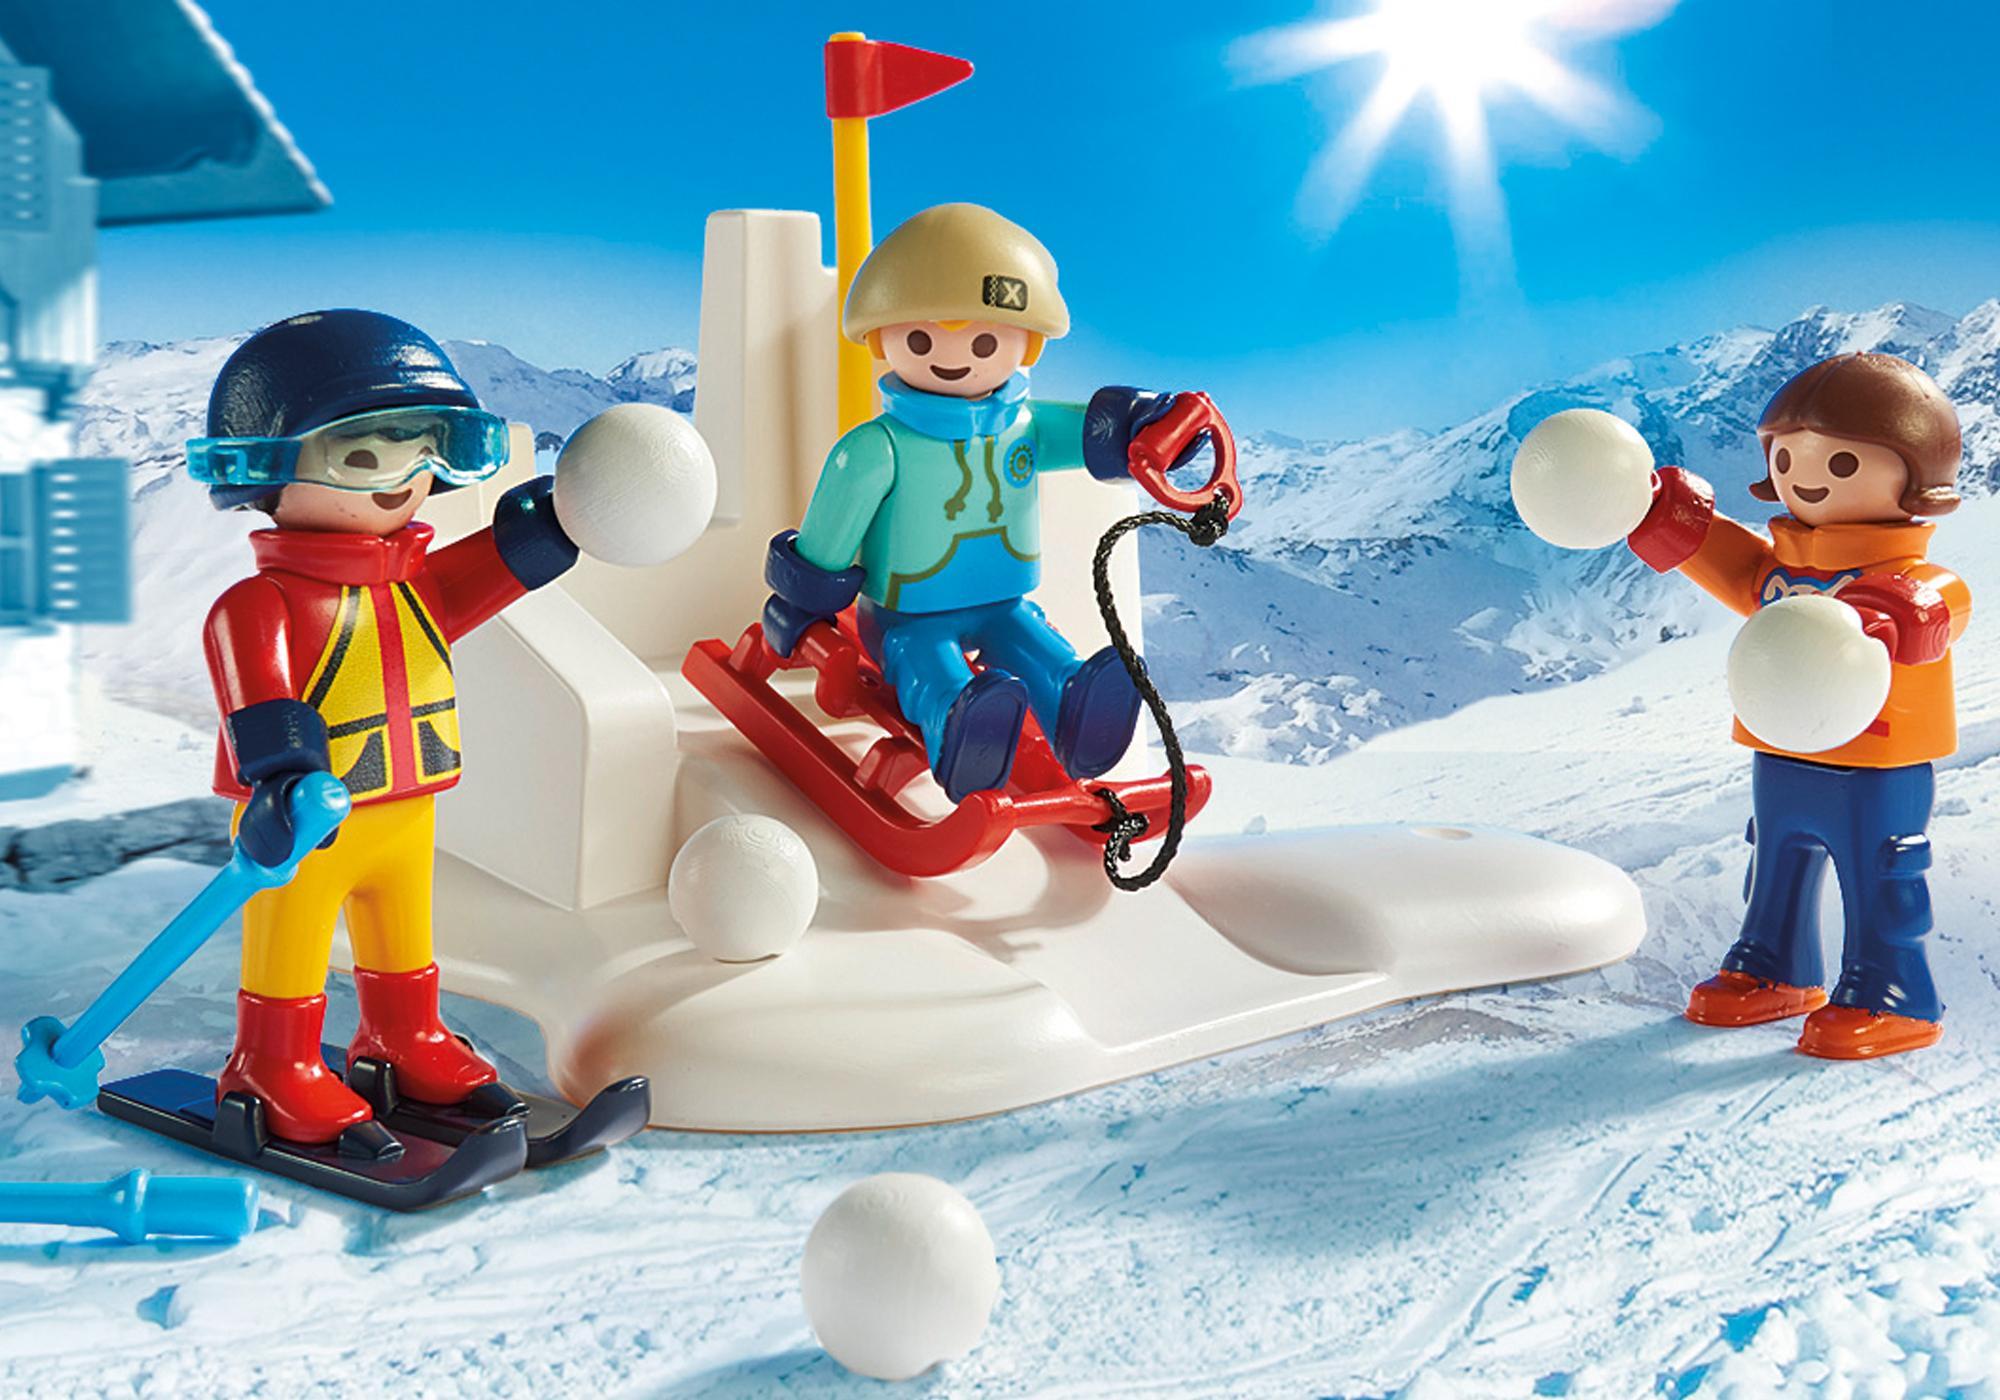 http://media.playmobil.com/i/playmobil/9283_product_extra1/Snowball Fight